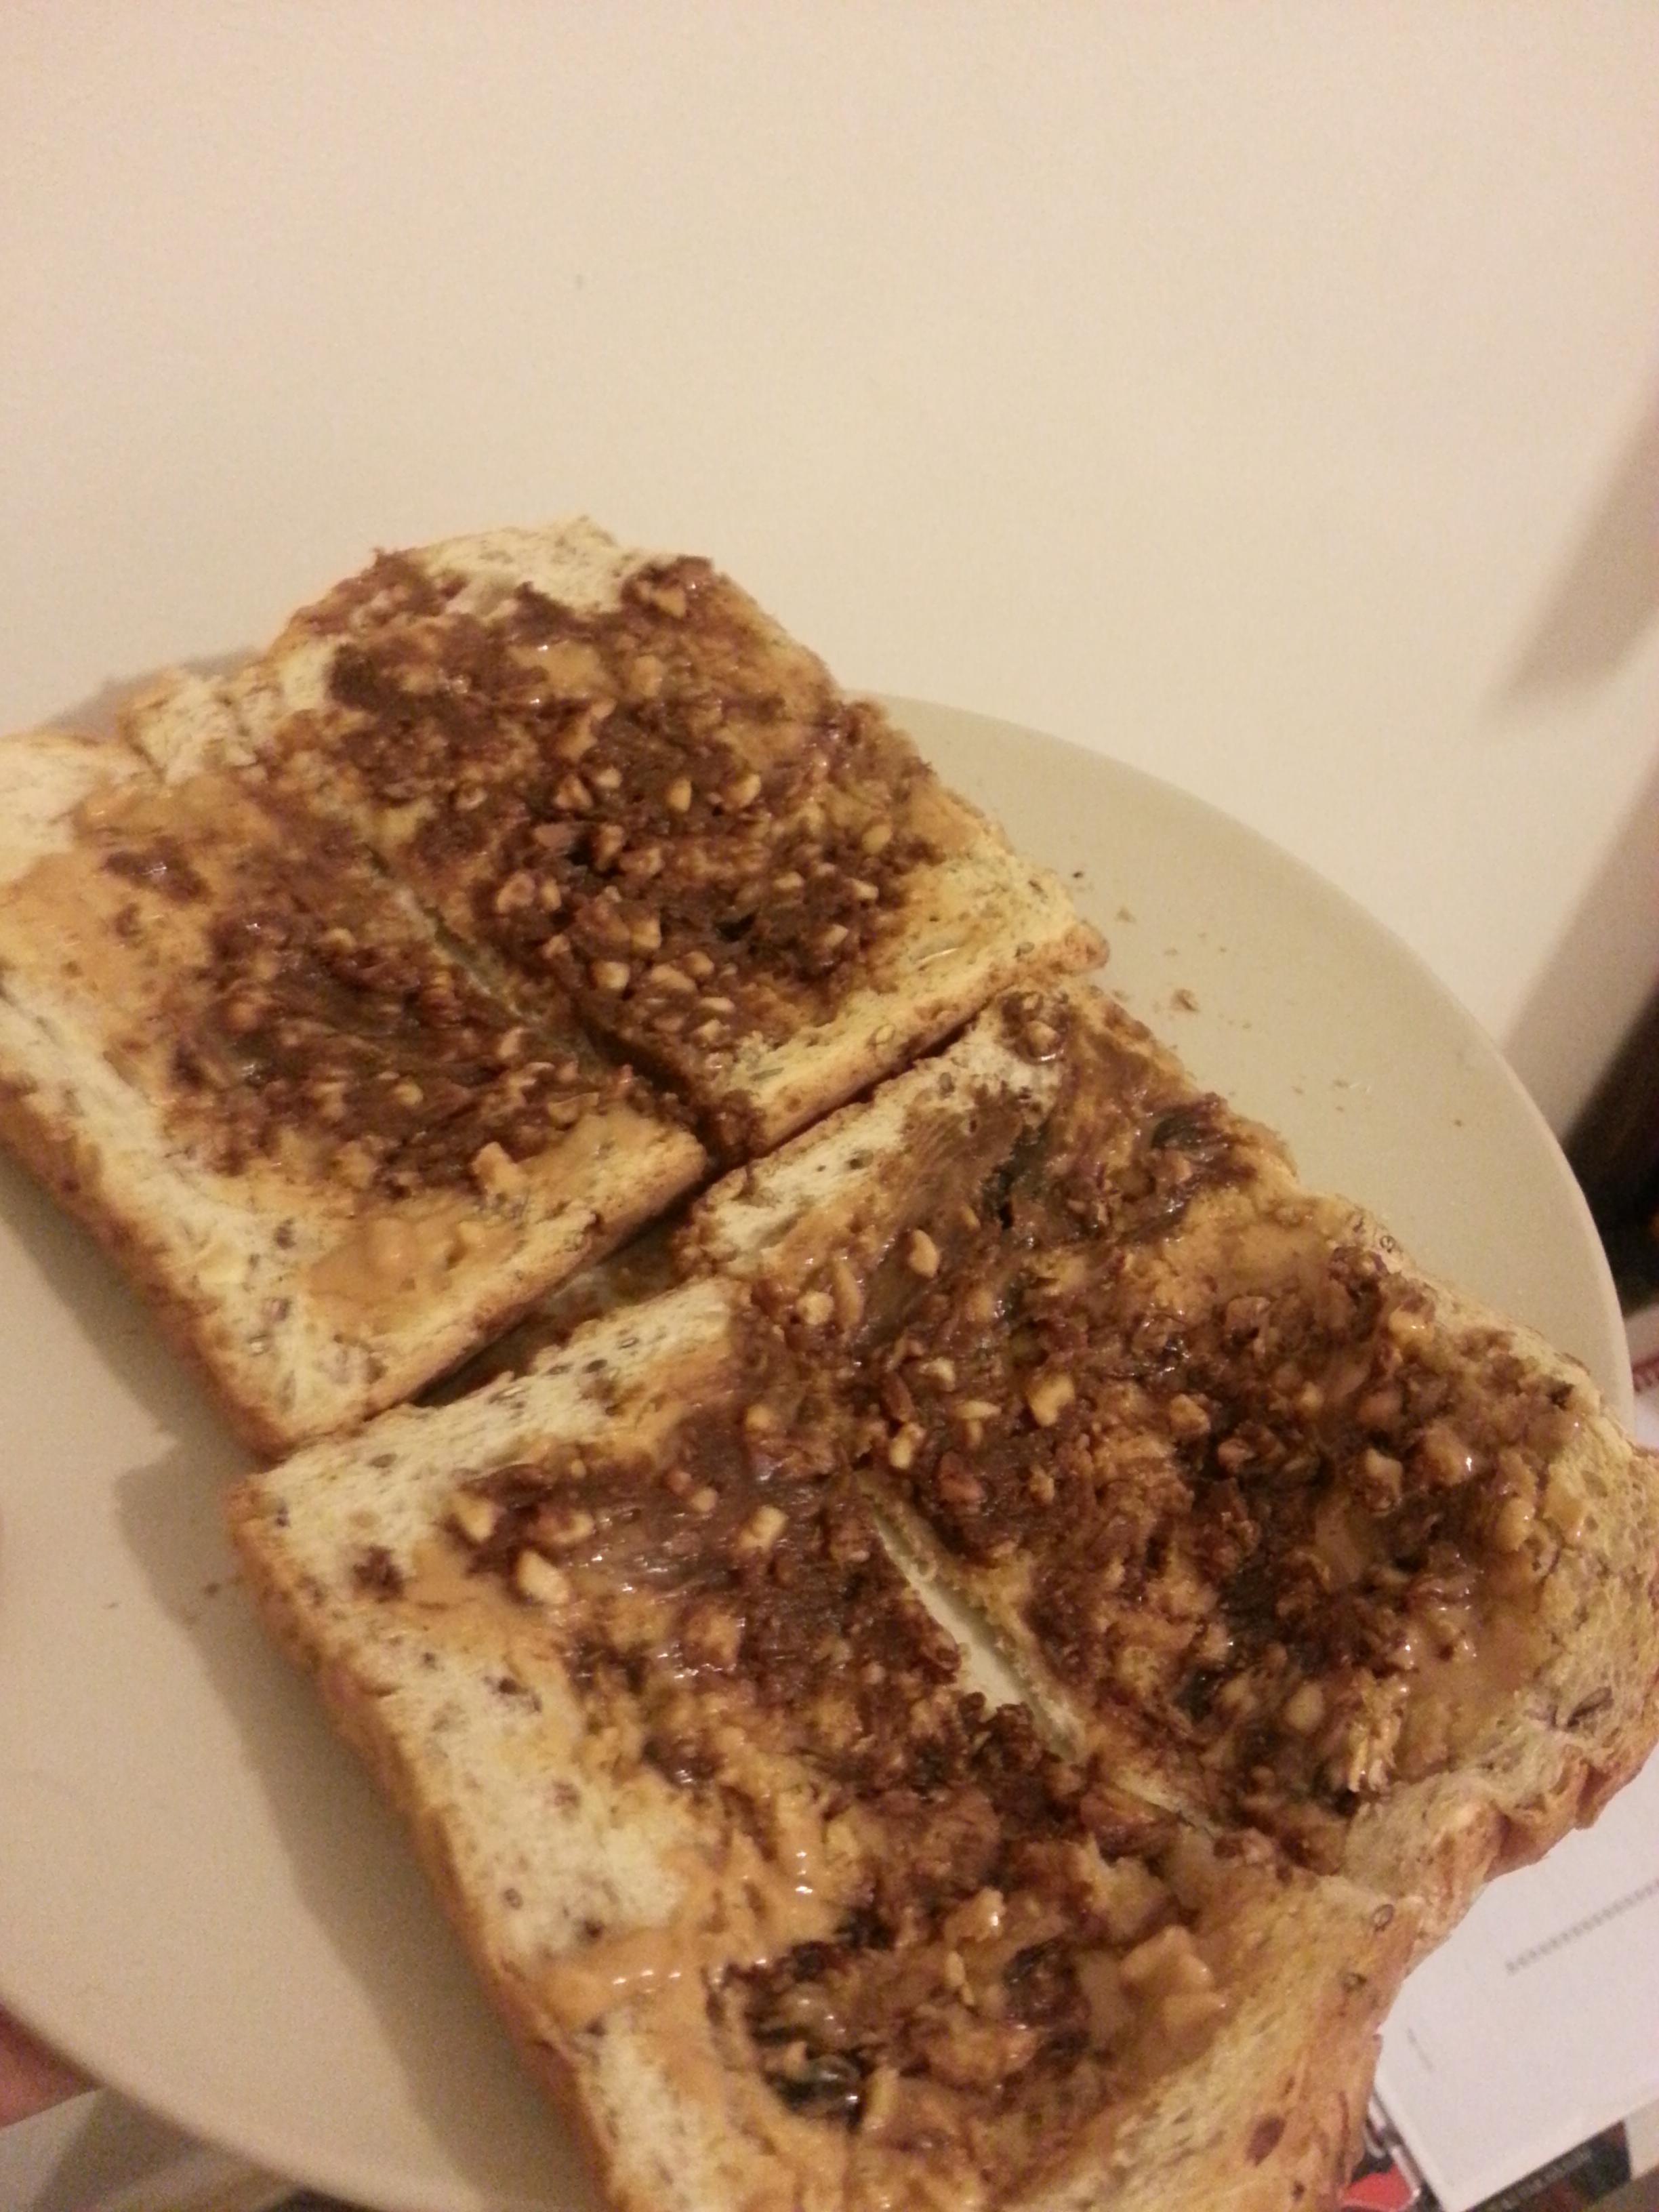 Peanut butter and Vegemite on toast. : shittyfoodporn